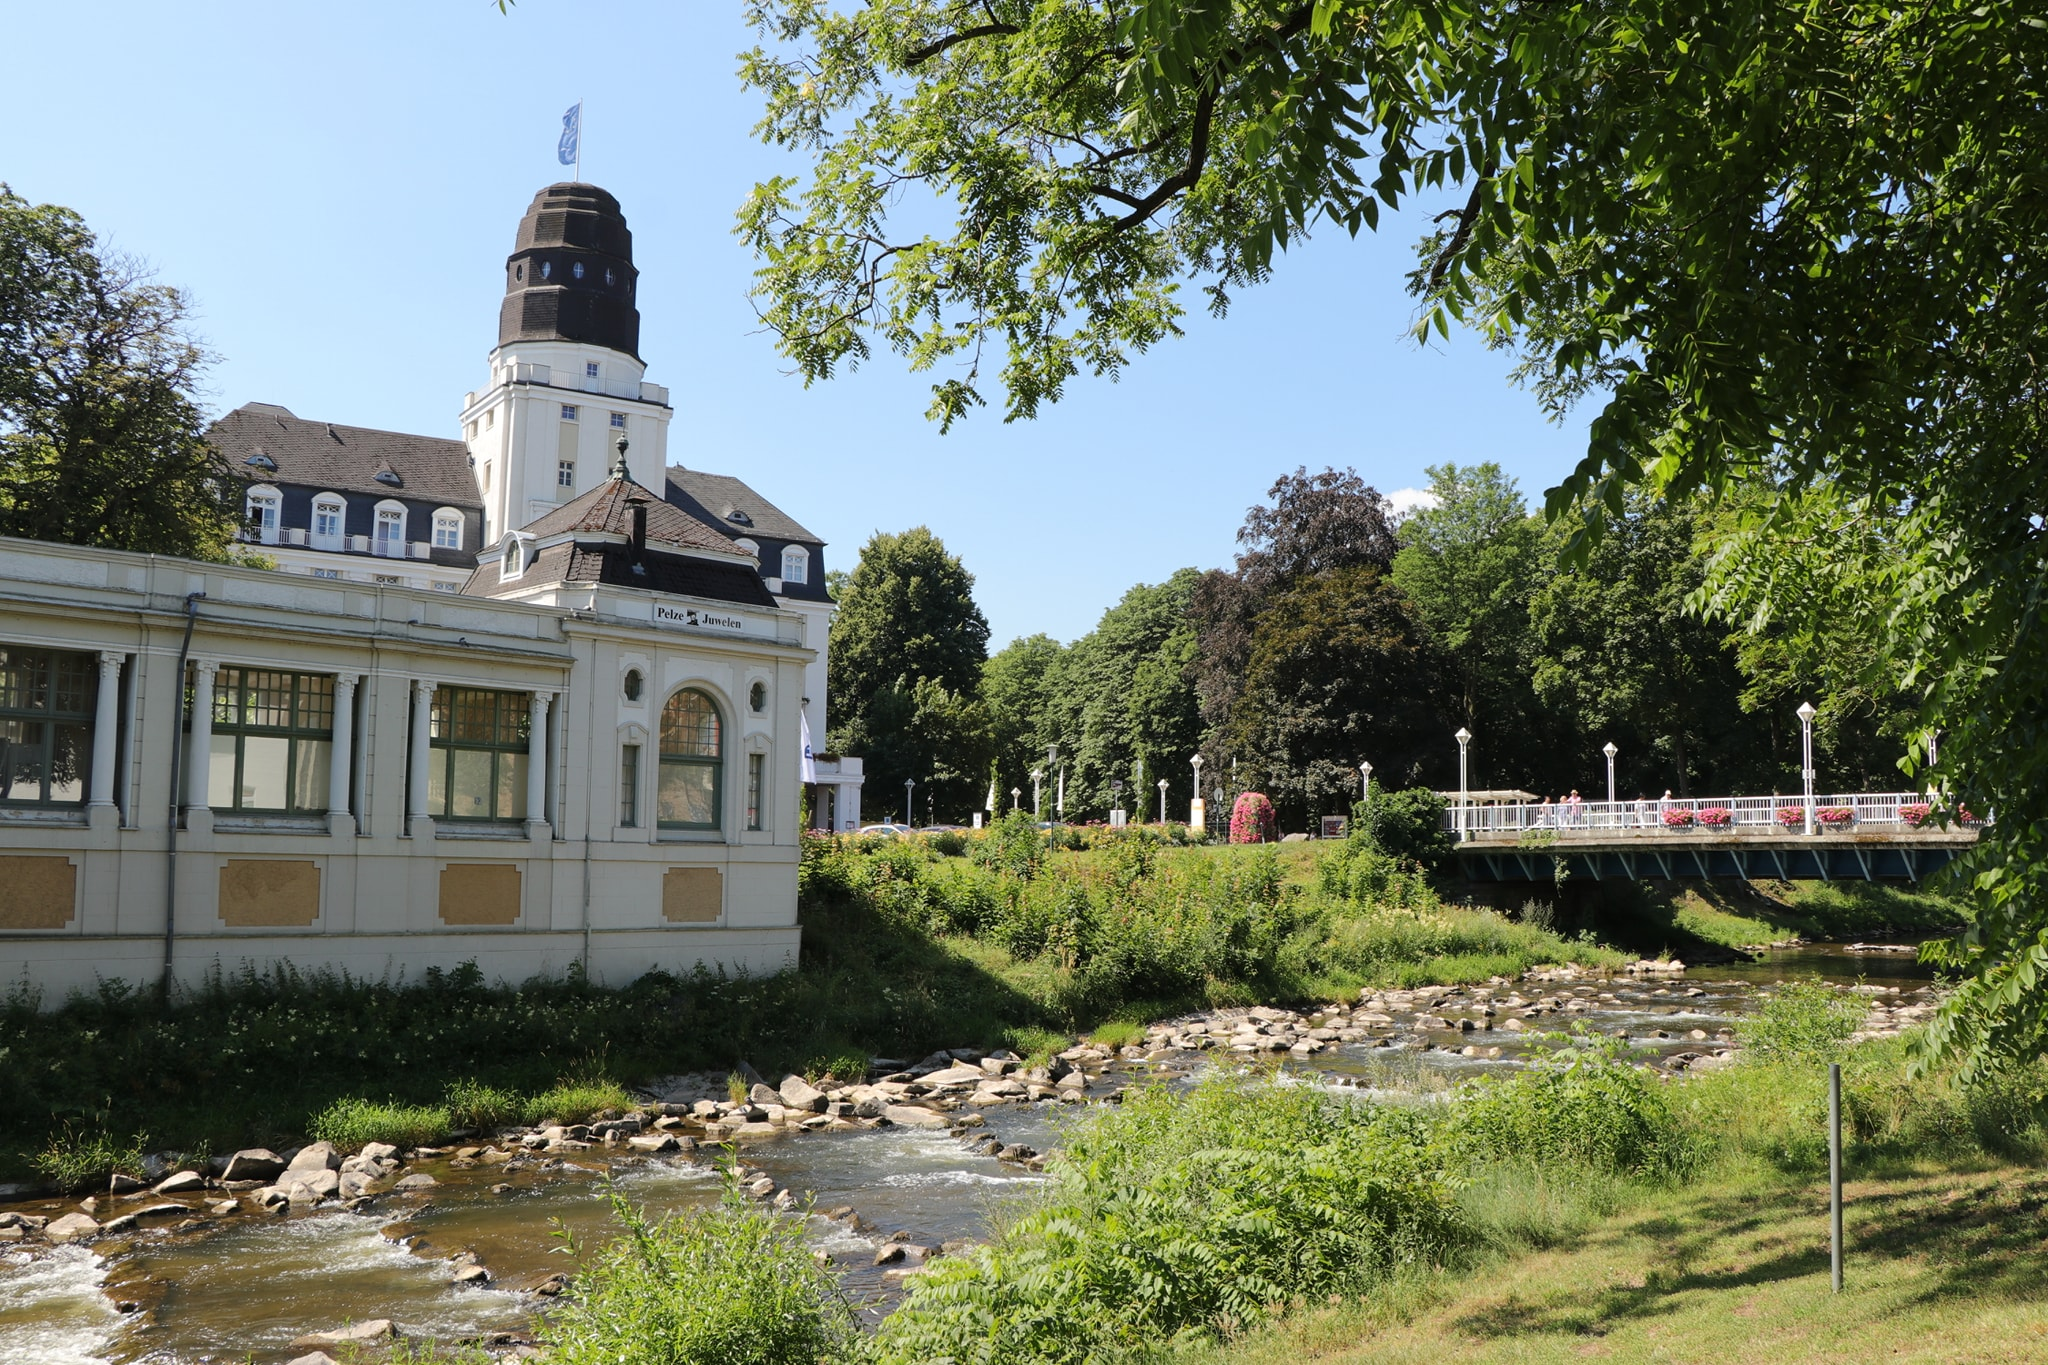 kurgartenbruecke